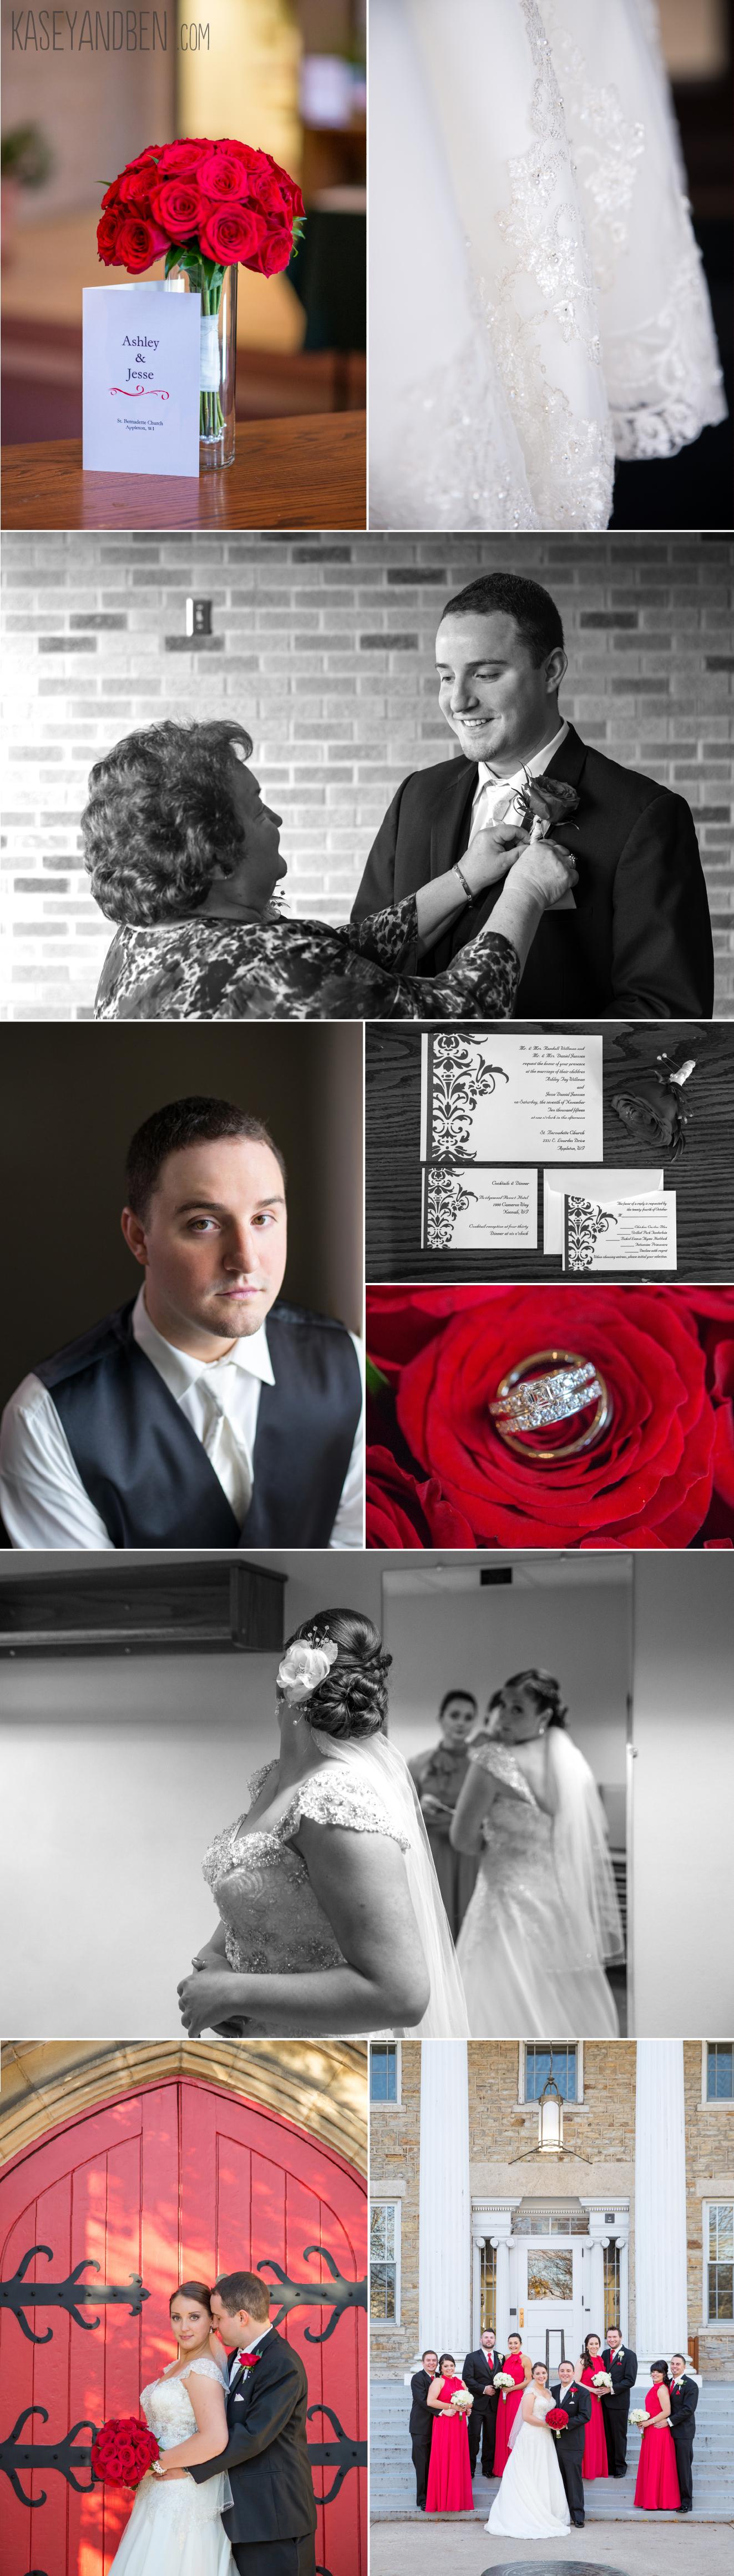 Appleton-Doty-Park-Wedding-Neenah-Fall-Church-Photography-November-Catholic-Green-Bay2